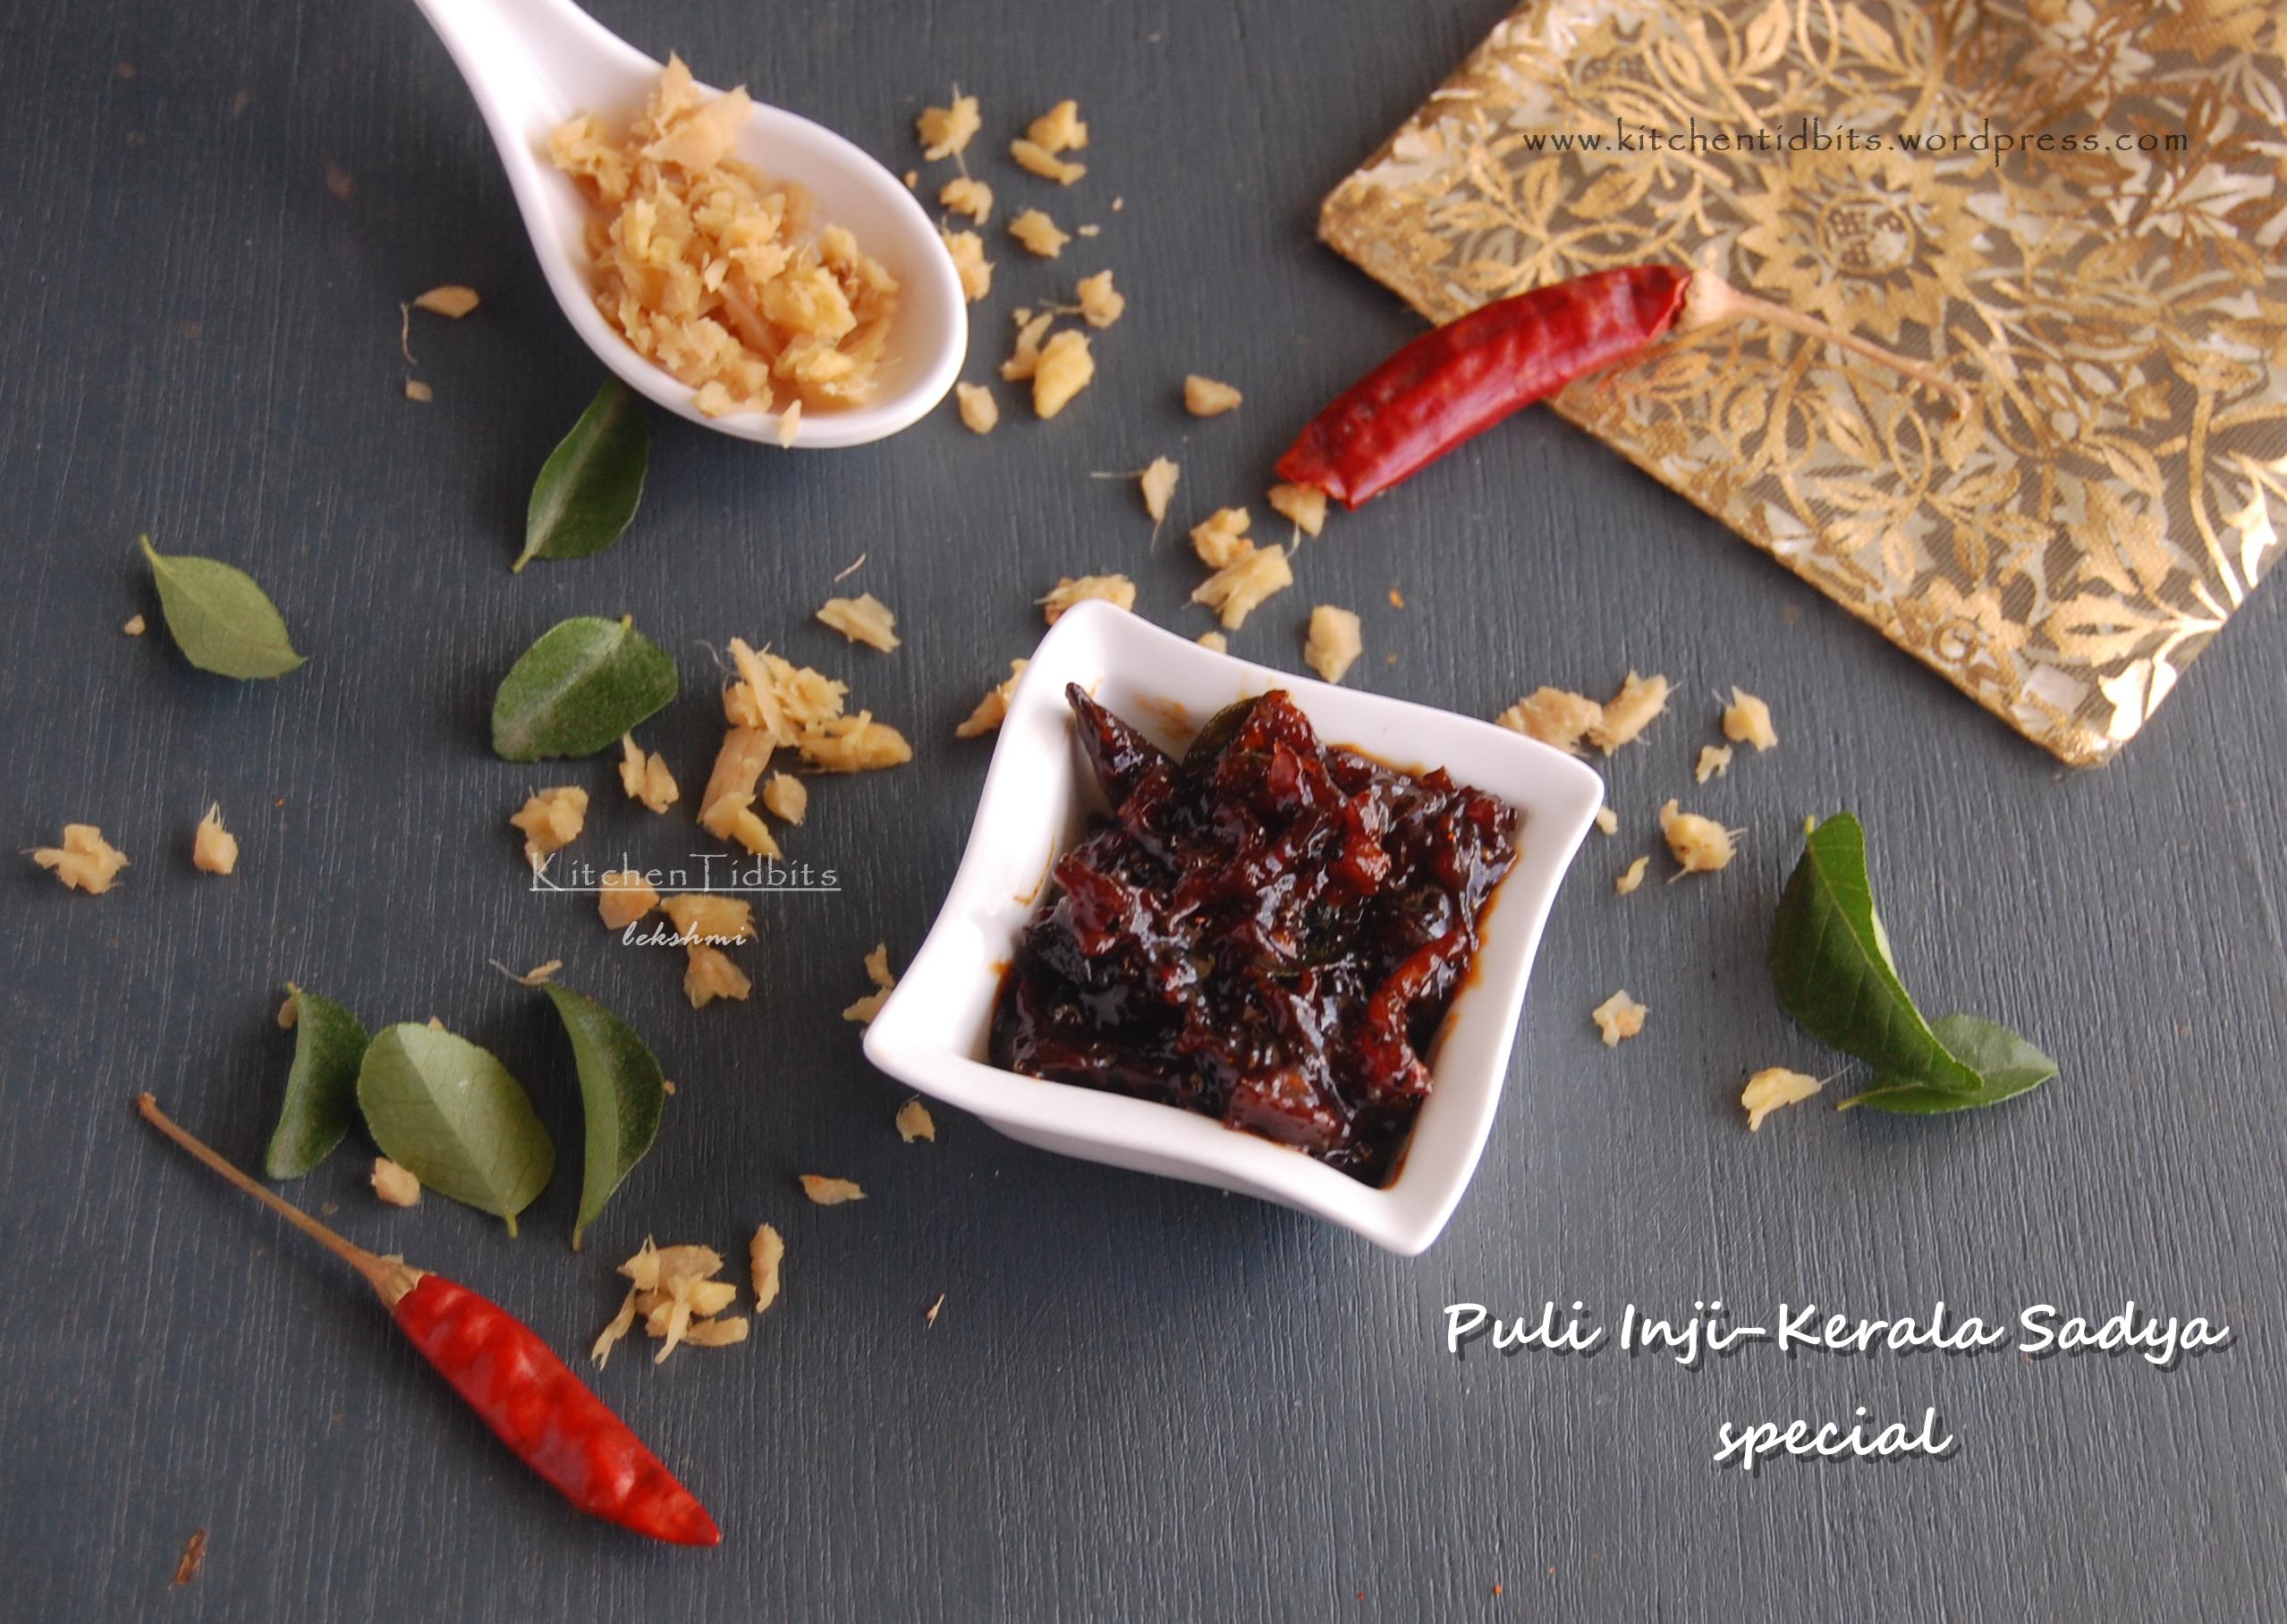 Puli inji- Inji Puli (kerala sadya Special)